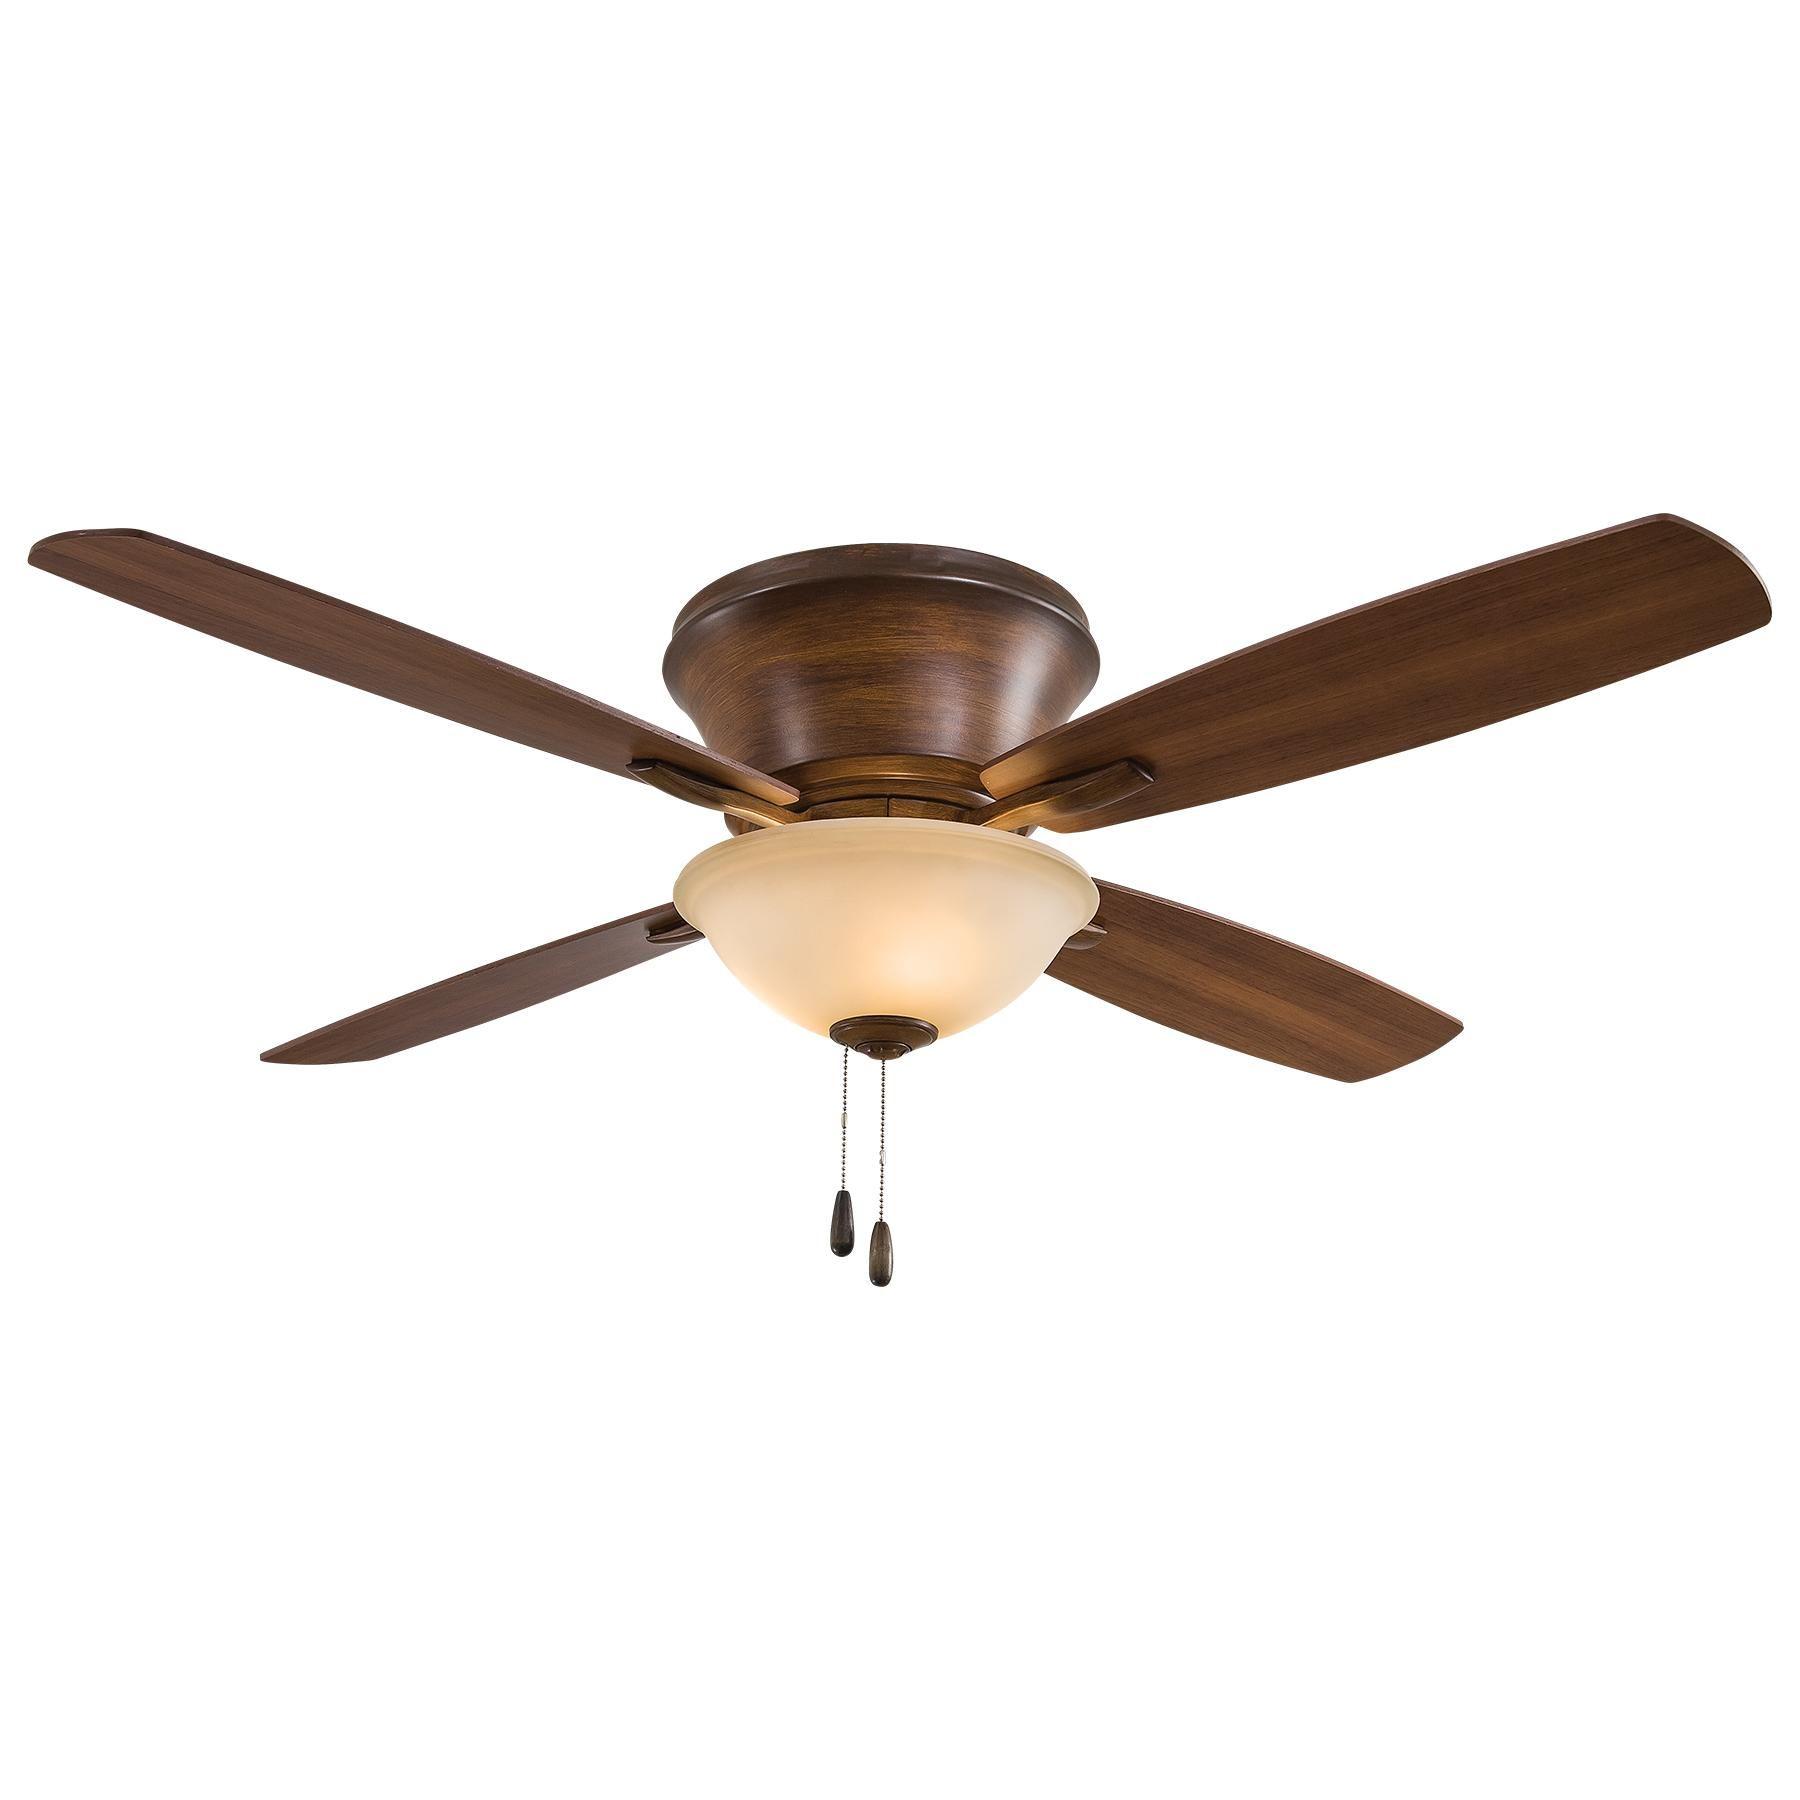 Minka aire mojo huggerflush mount ceiling fan for living room 526 minka aire mojo huggerflush mount ceiling fan for living room 526 t mozeypictures Choice Image